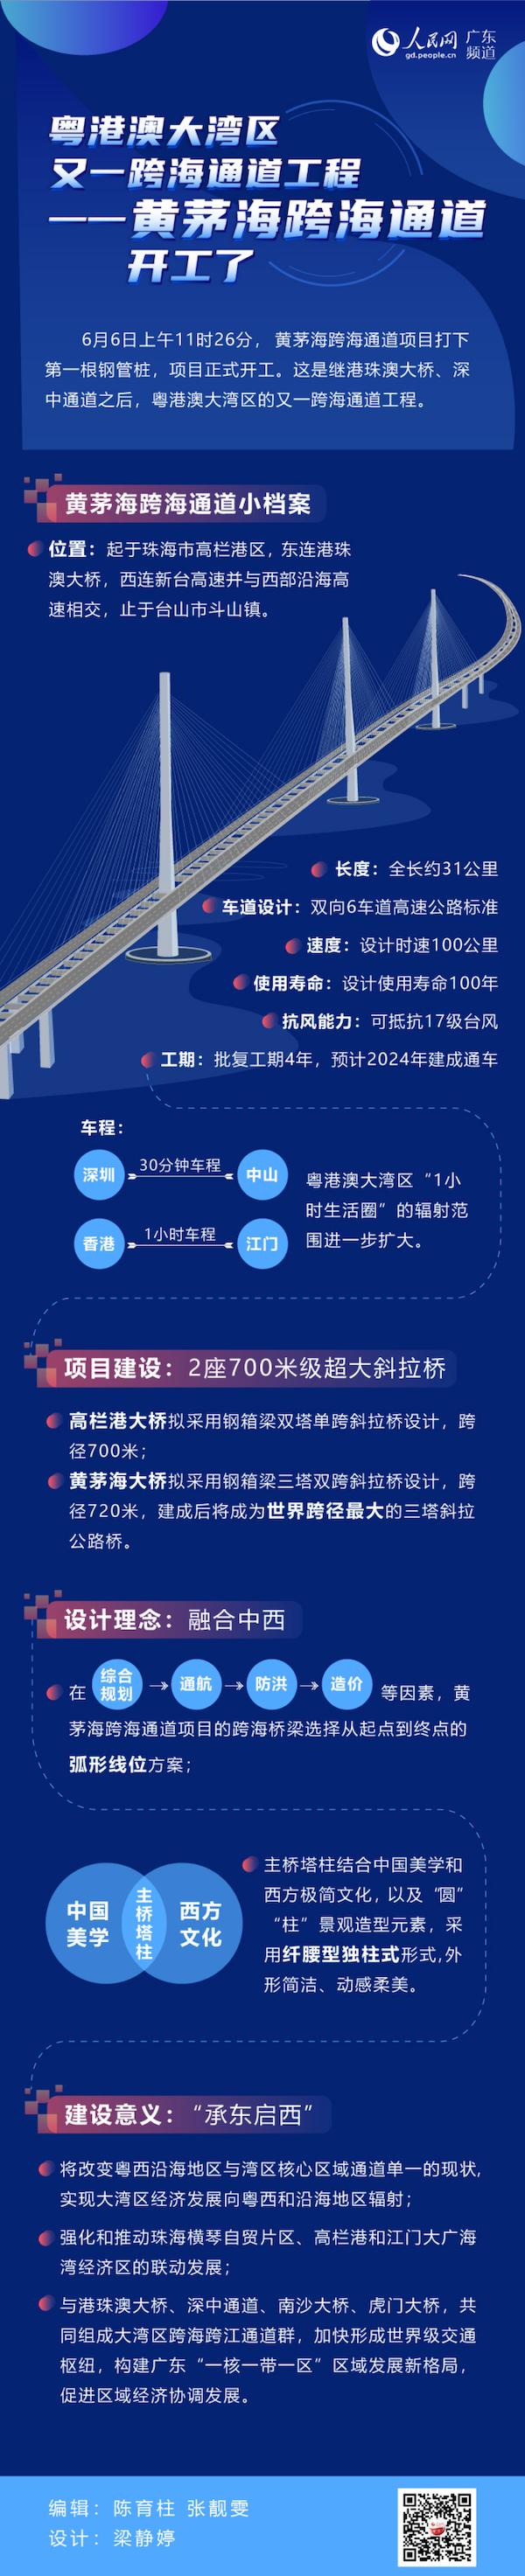 导出图片Mon Jun 15 2020 10_24_36 GMT+0800 (中国标准时间).png